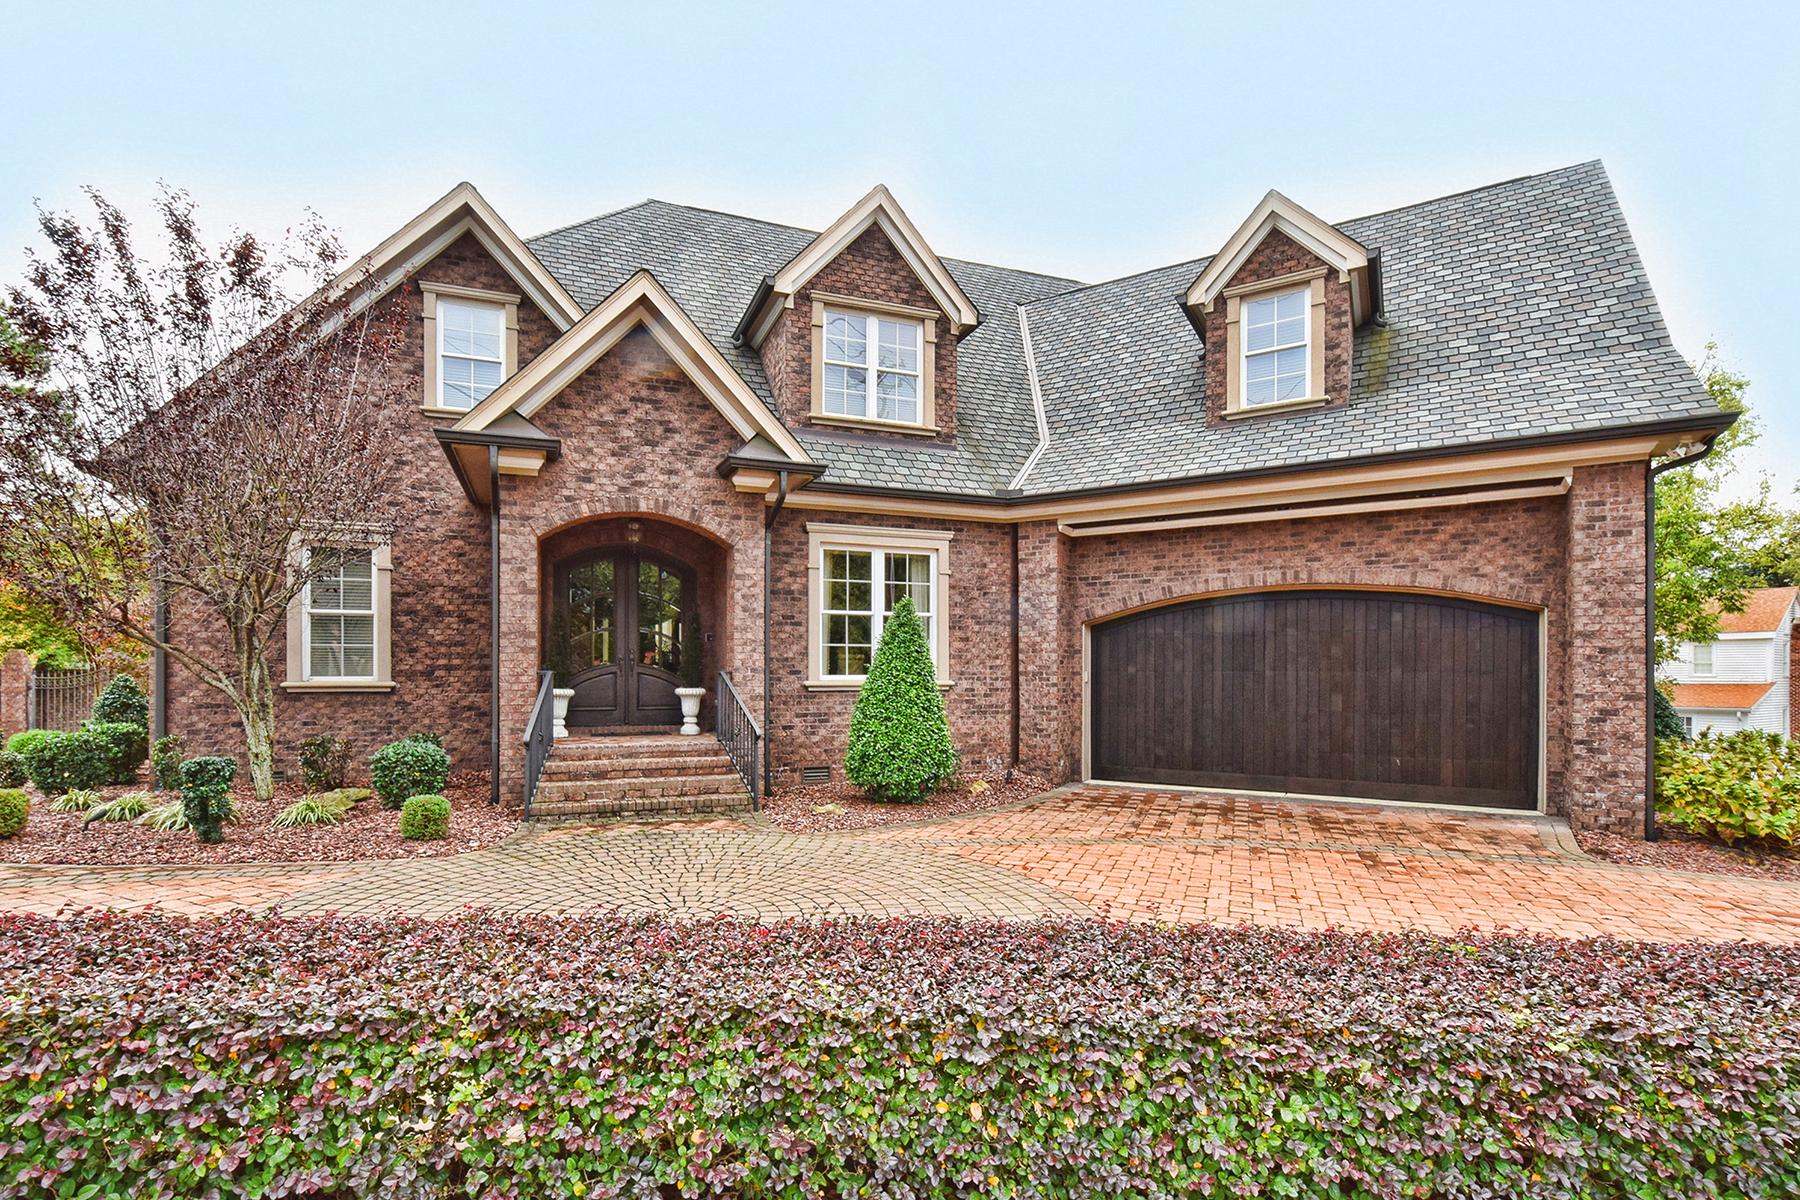 Single Family Home for Sale at MECKLENBERG 6500 Alexander Rd Charlotte, North Carolina, 28270 United States